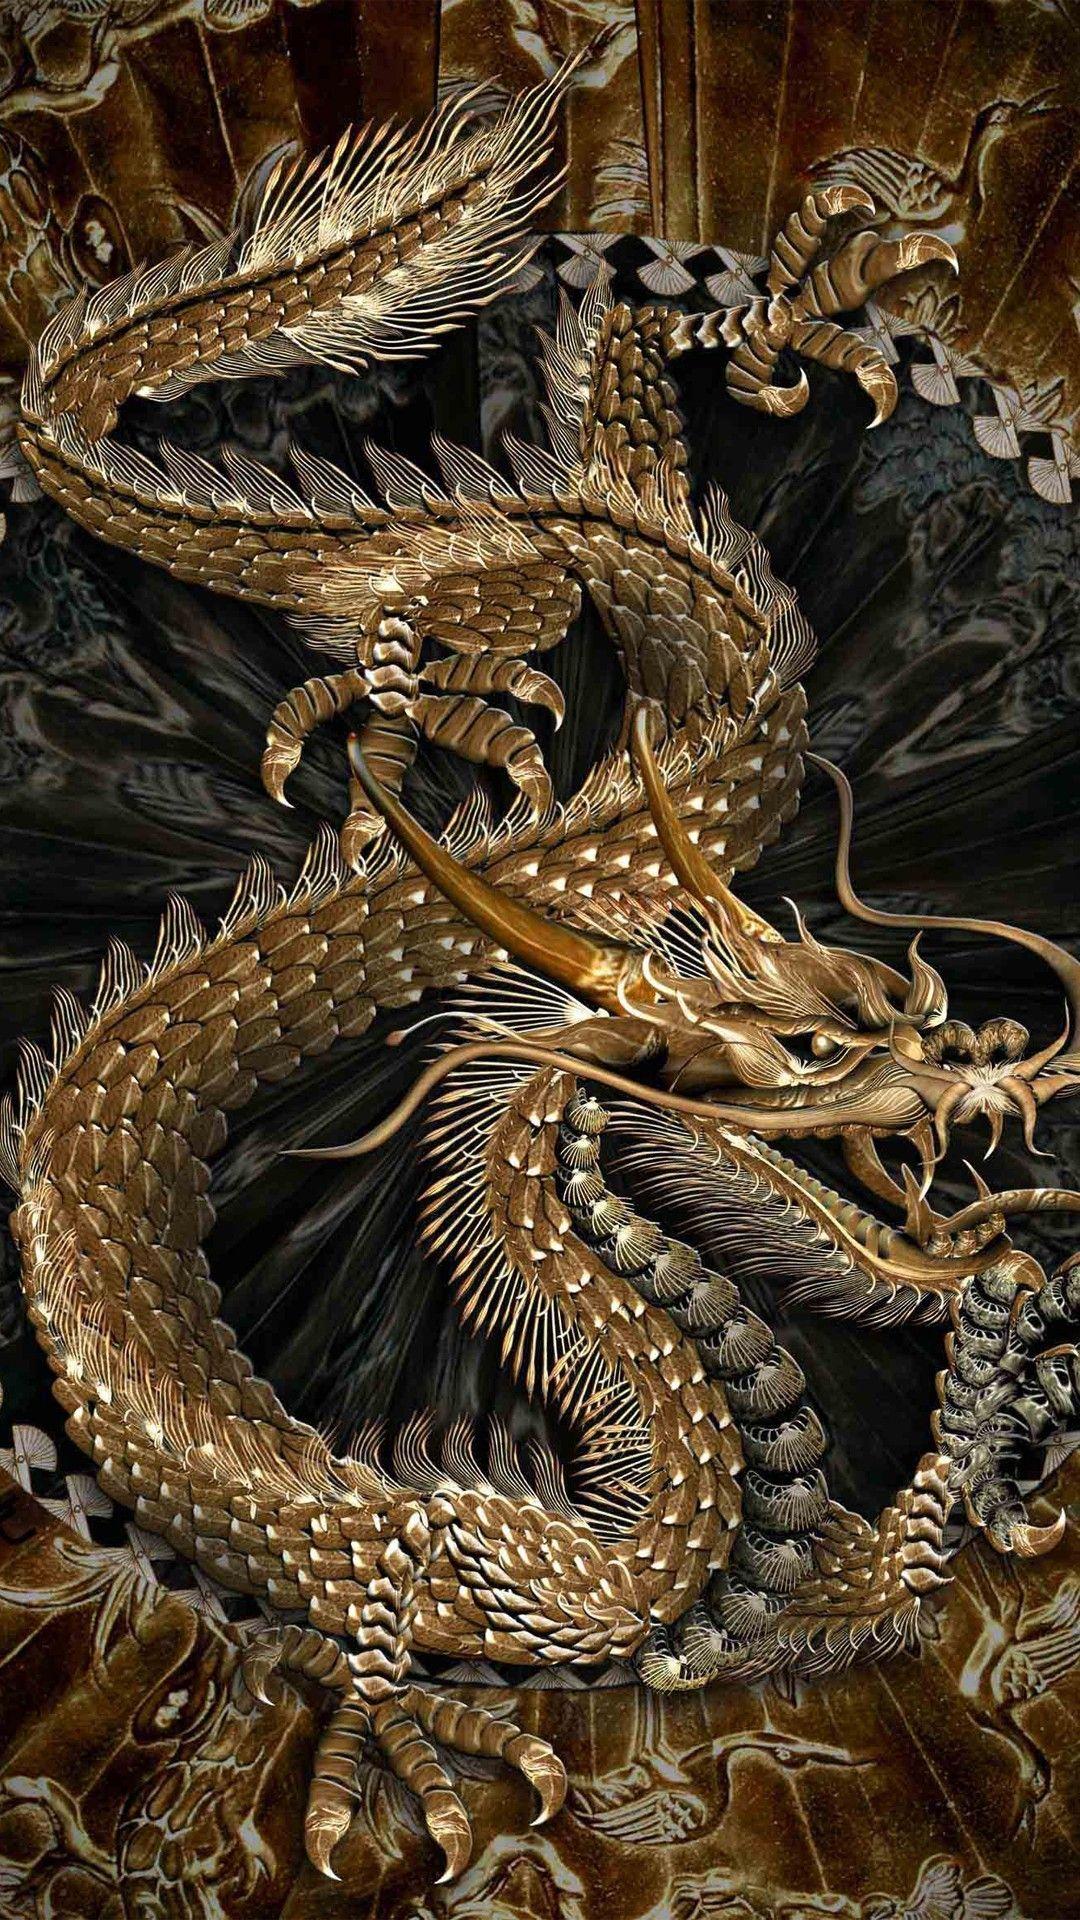 Oriental Dragon Wallpaper Chinese Dragon Wallpaper Images De Dragons Oeuvre De Dragon Dragons